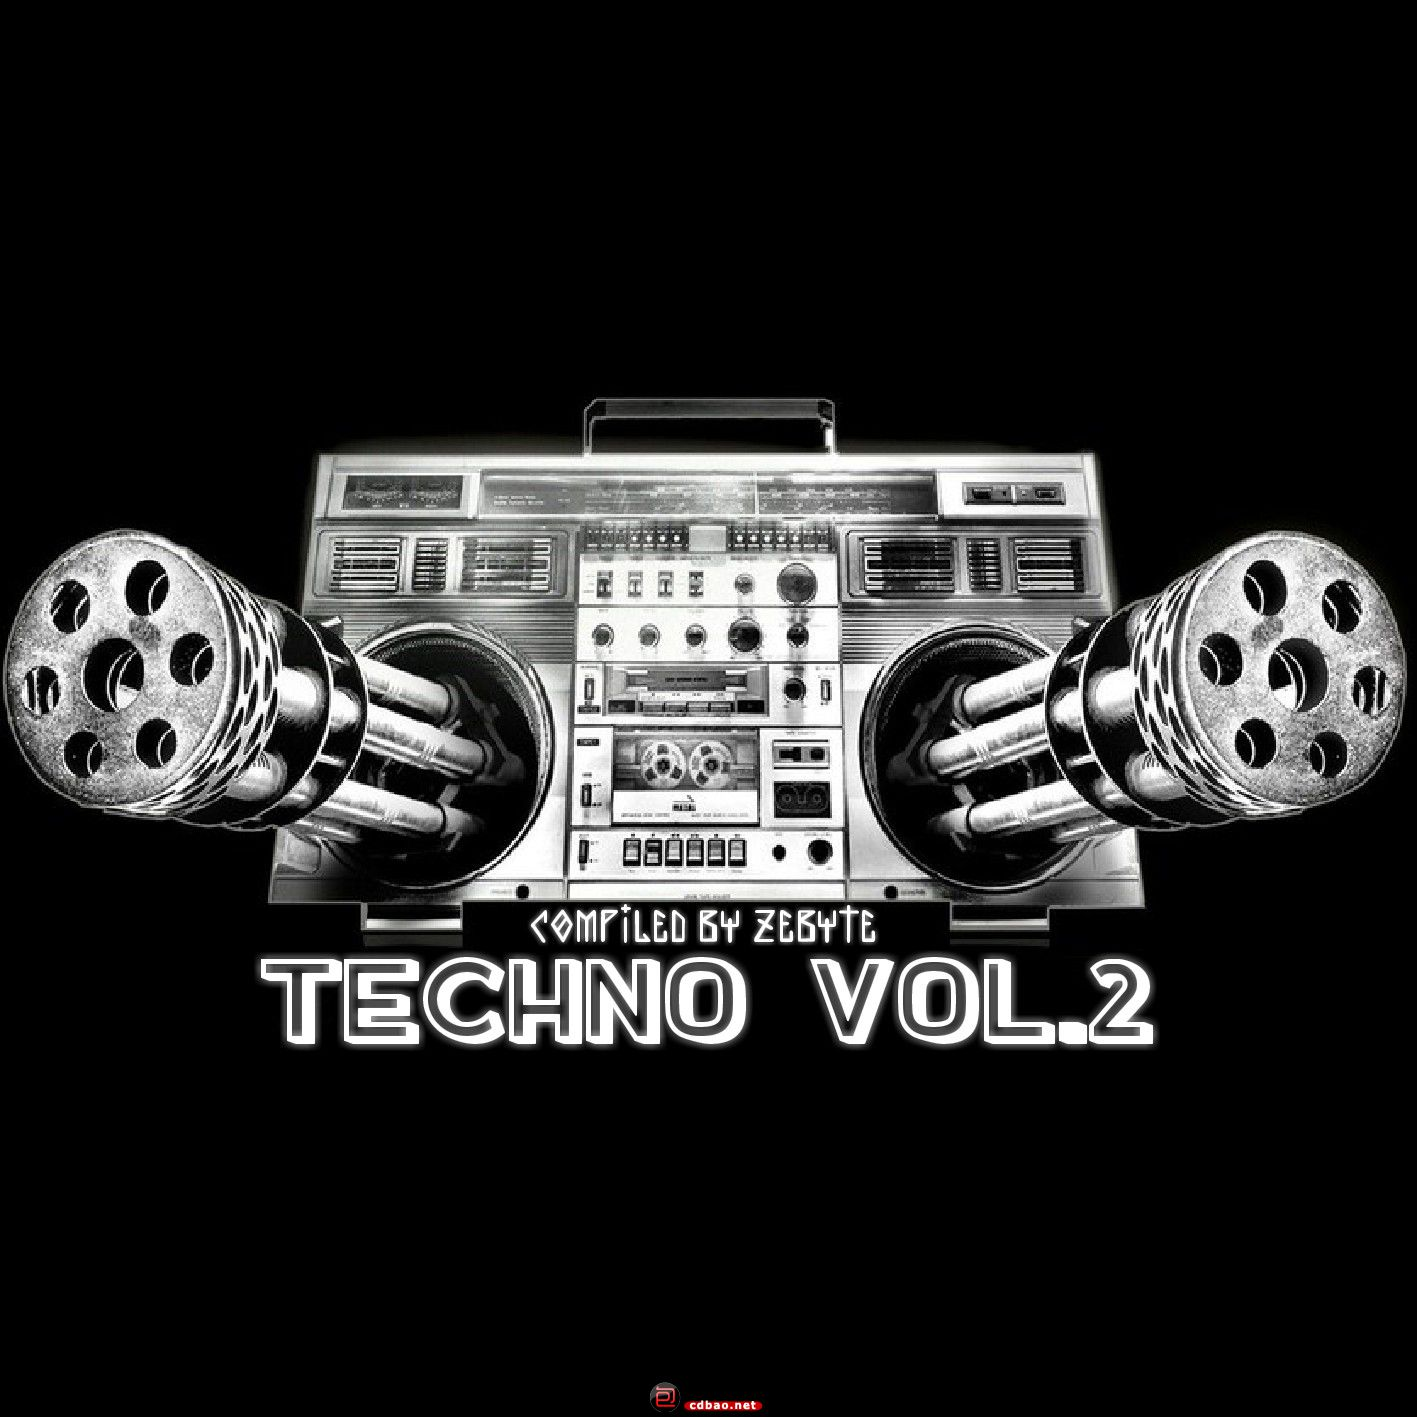 Techno_2.jpg